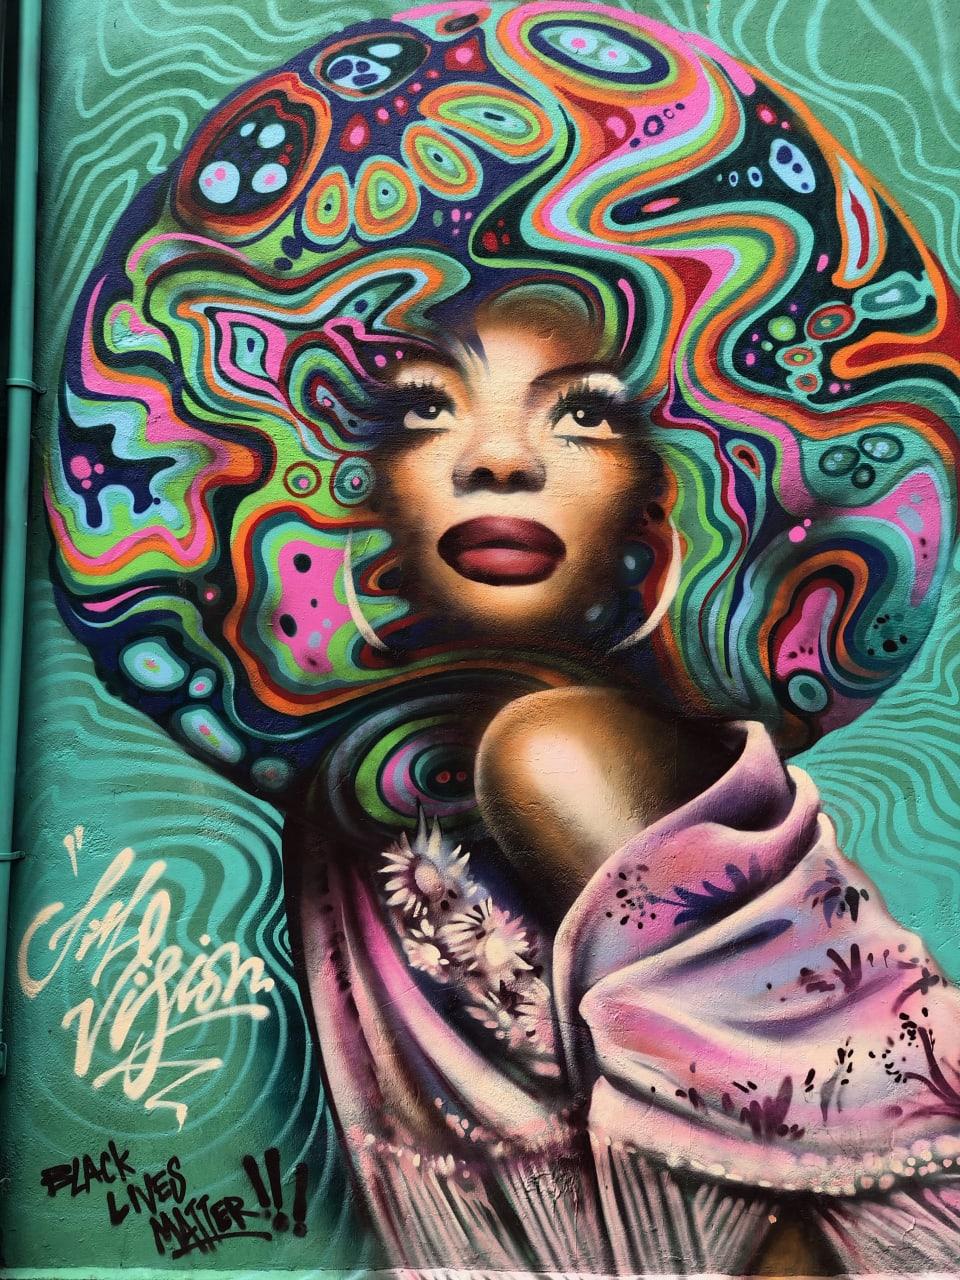 London - Shoreditch: The Mecca of London's Street Art